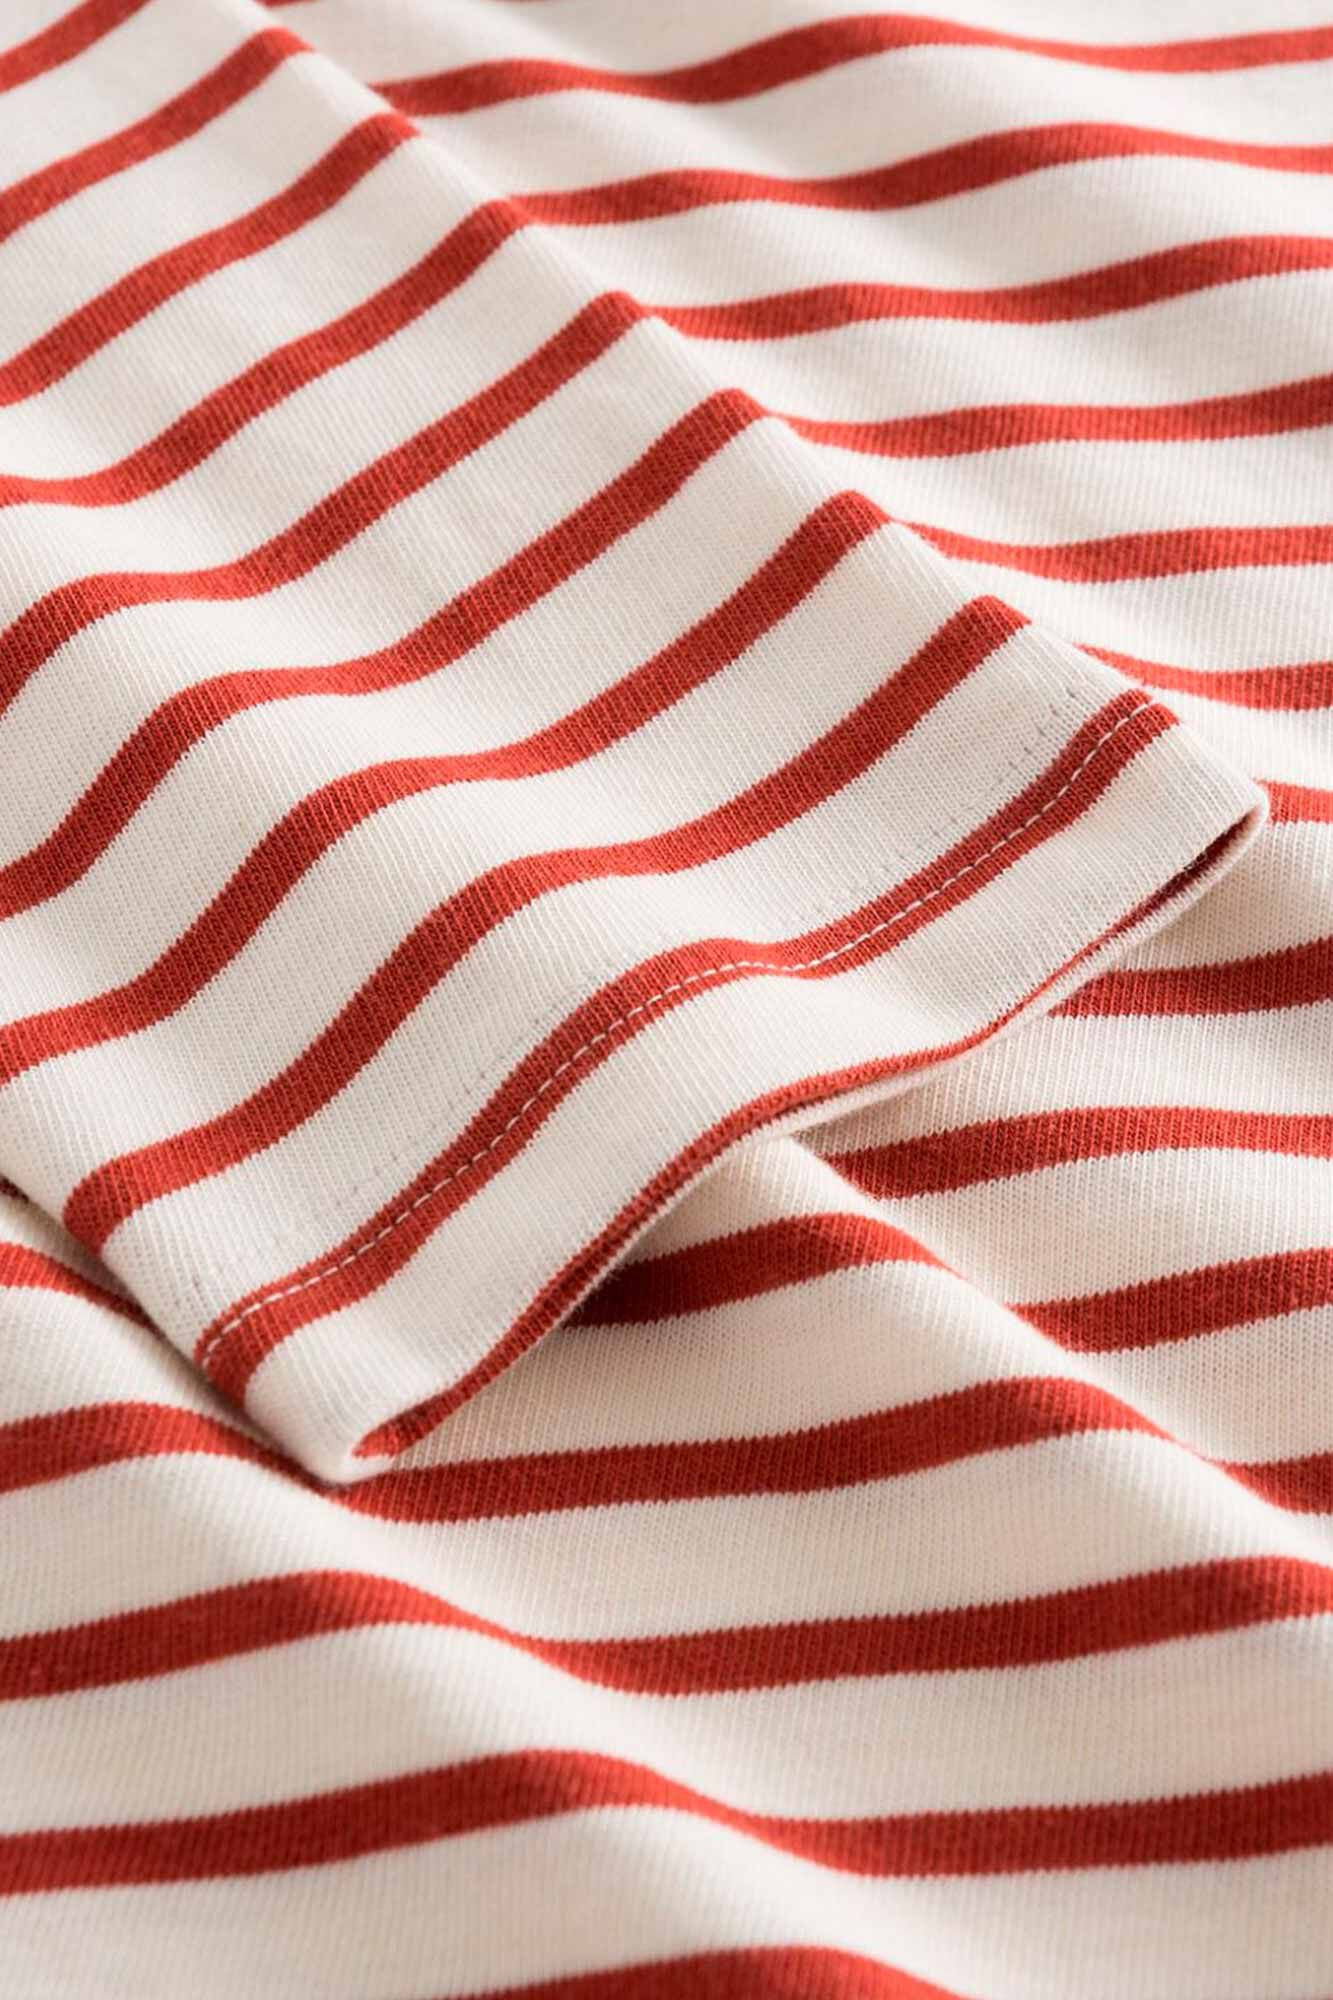 Mel long sleeve 10945402-2323, OFF-WHITE/RUST STRIPES